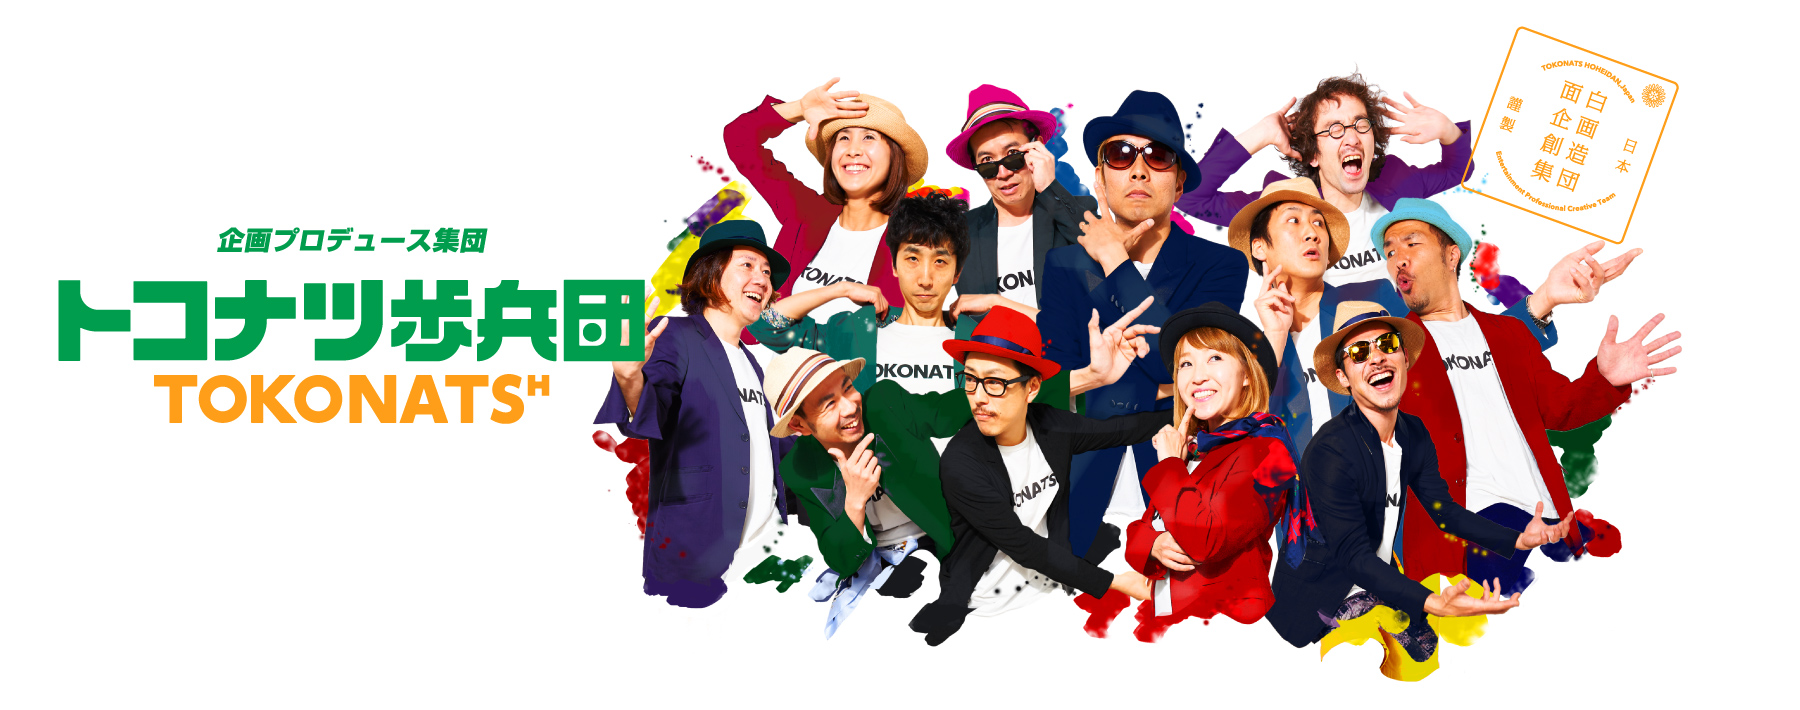 The Entertainment Professional Creative Team トコナツ歩兵団 TOKONATS